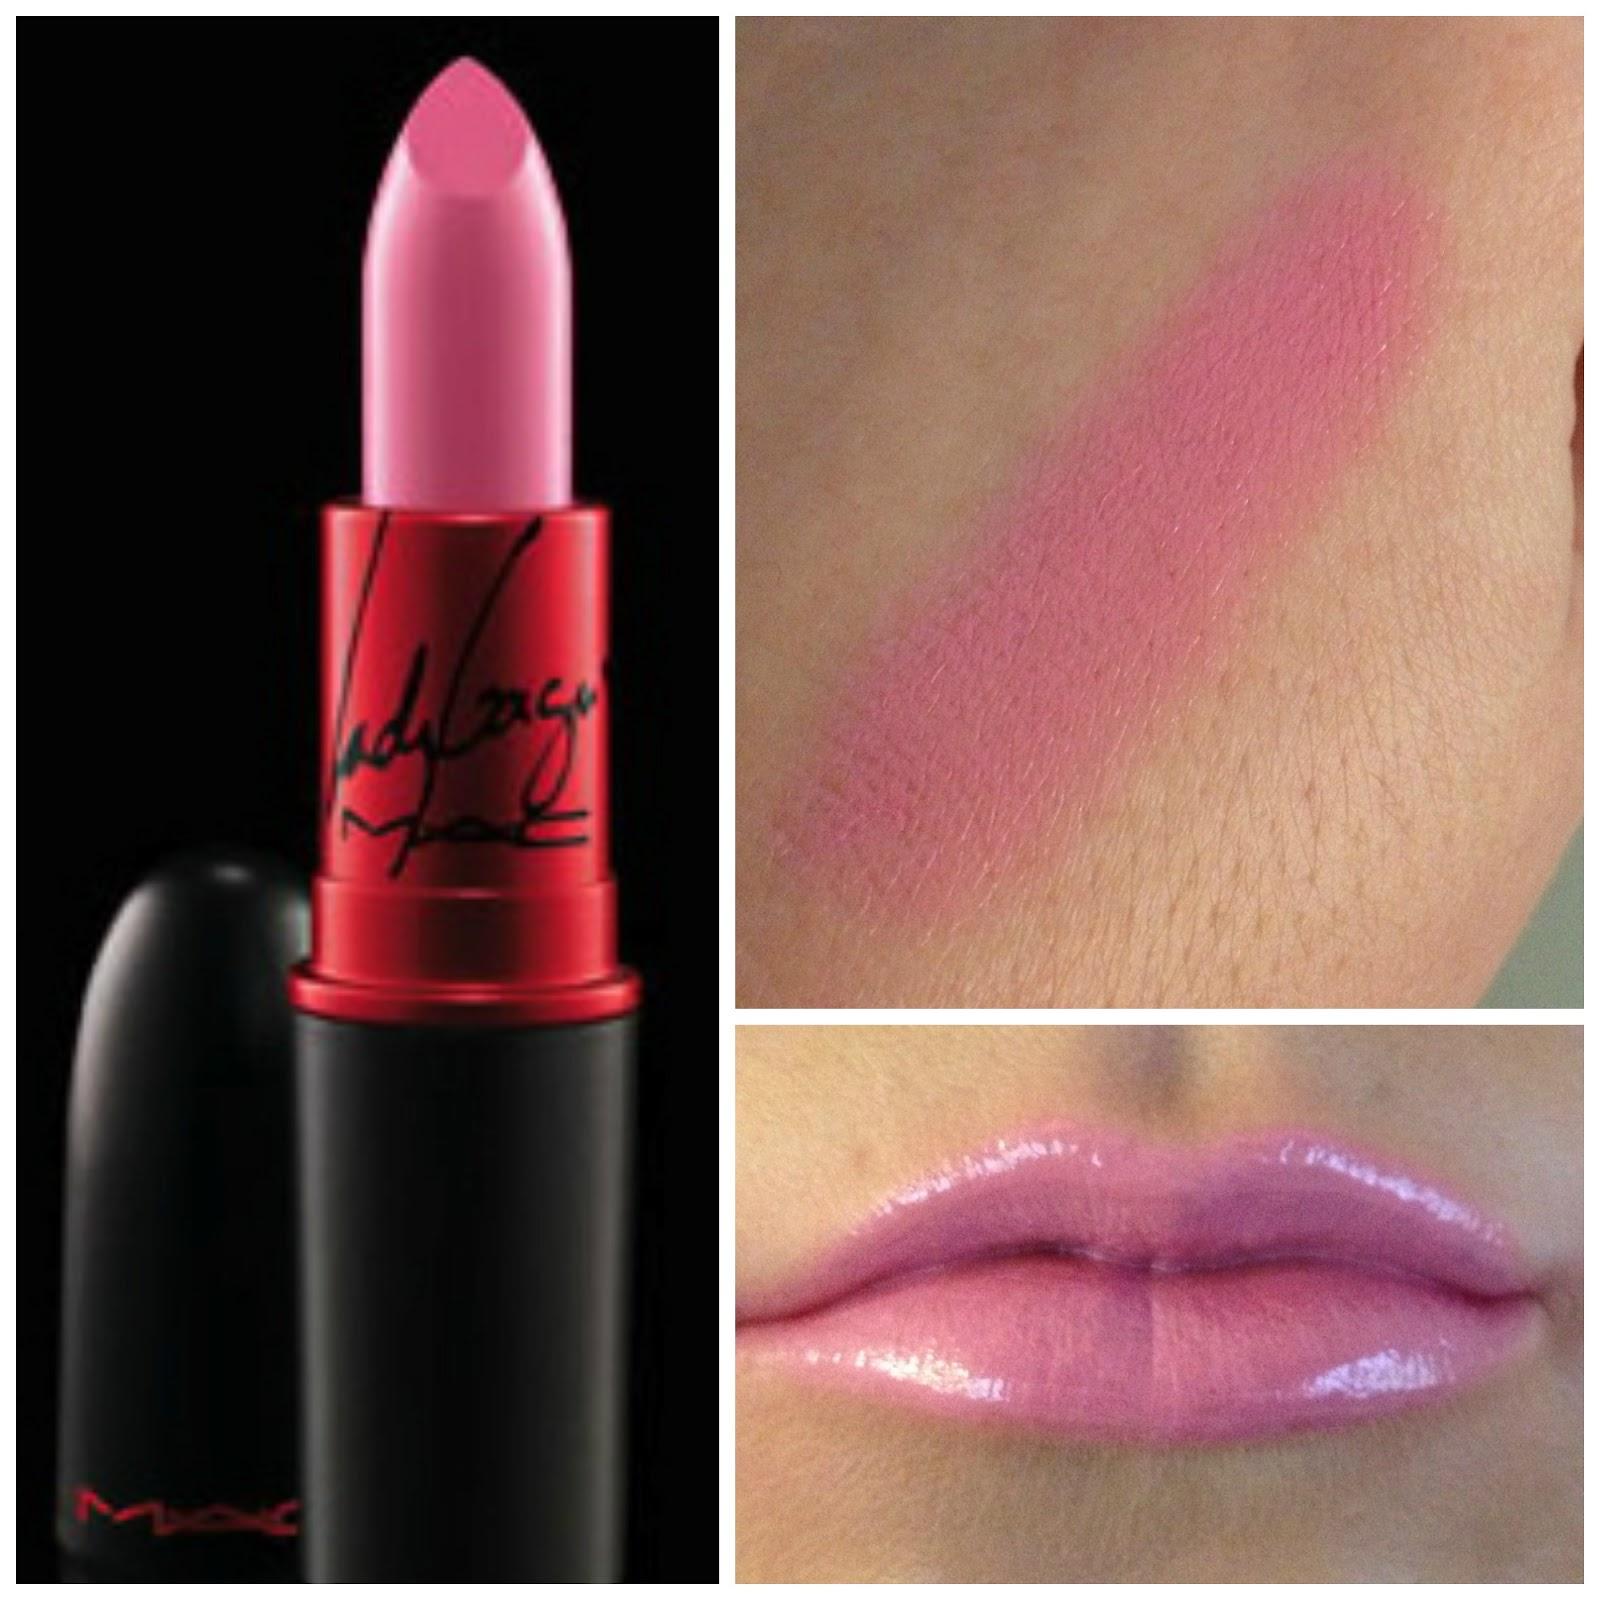 My Favourite Lipsticks from MAC | KELLiLASH